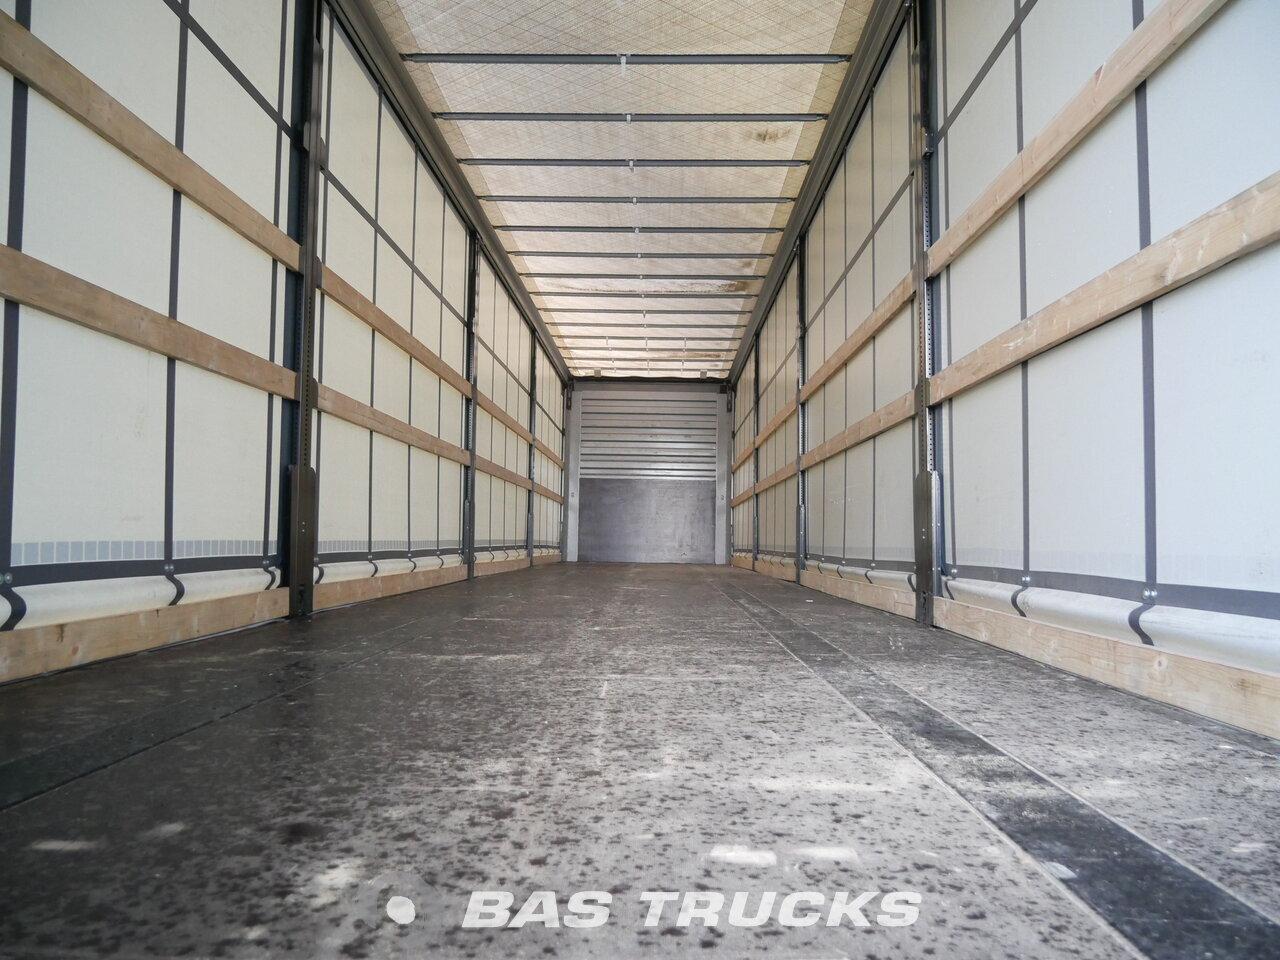 photo of New Semi-trailer CIMC SG 03 Axels